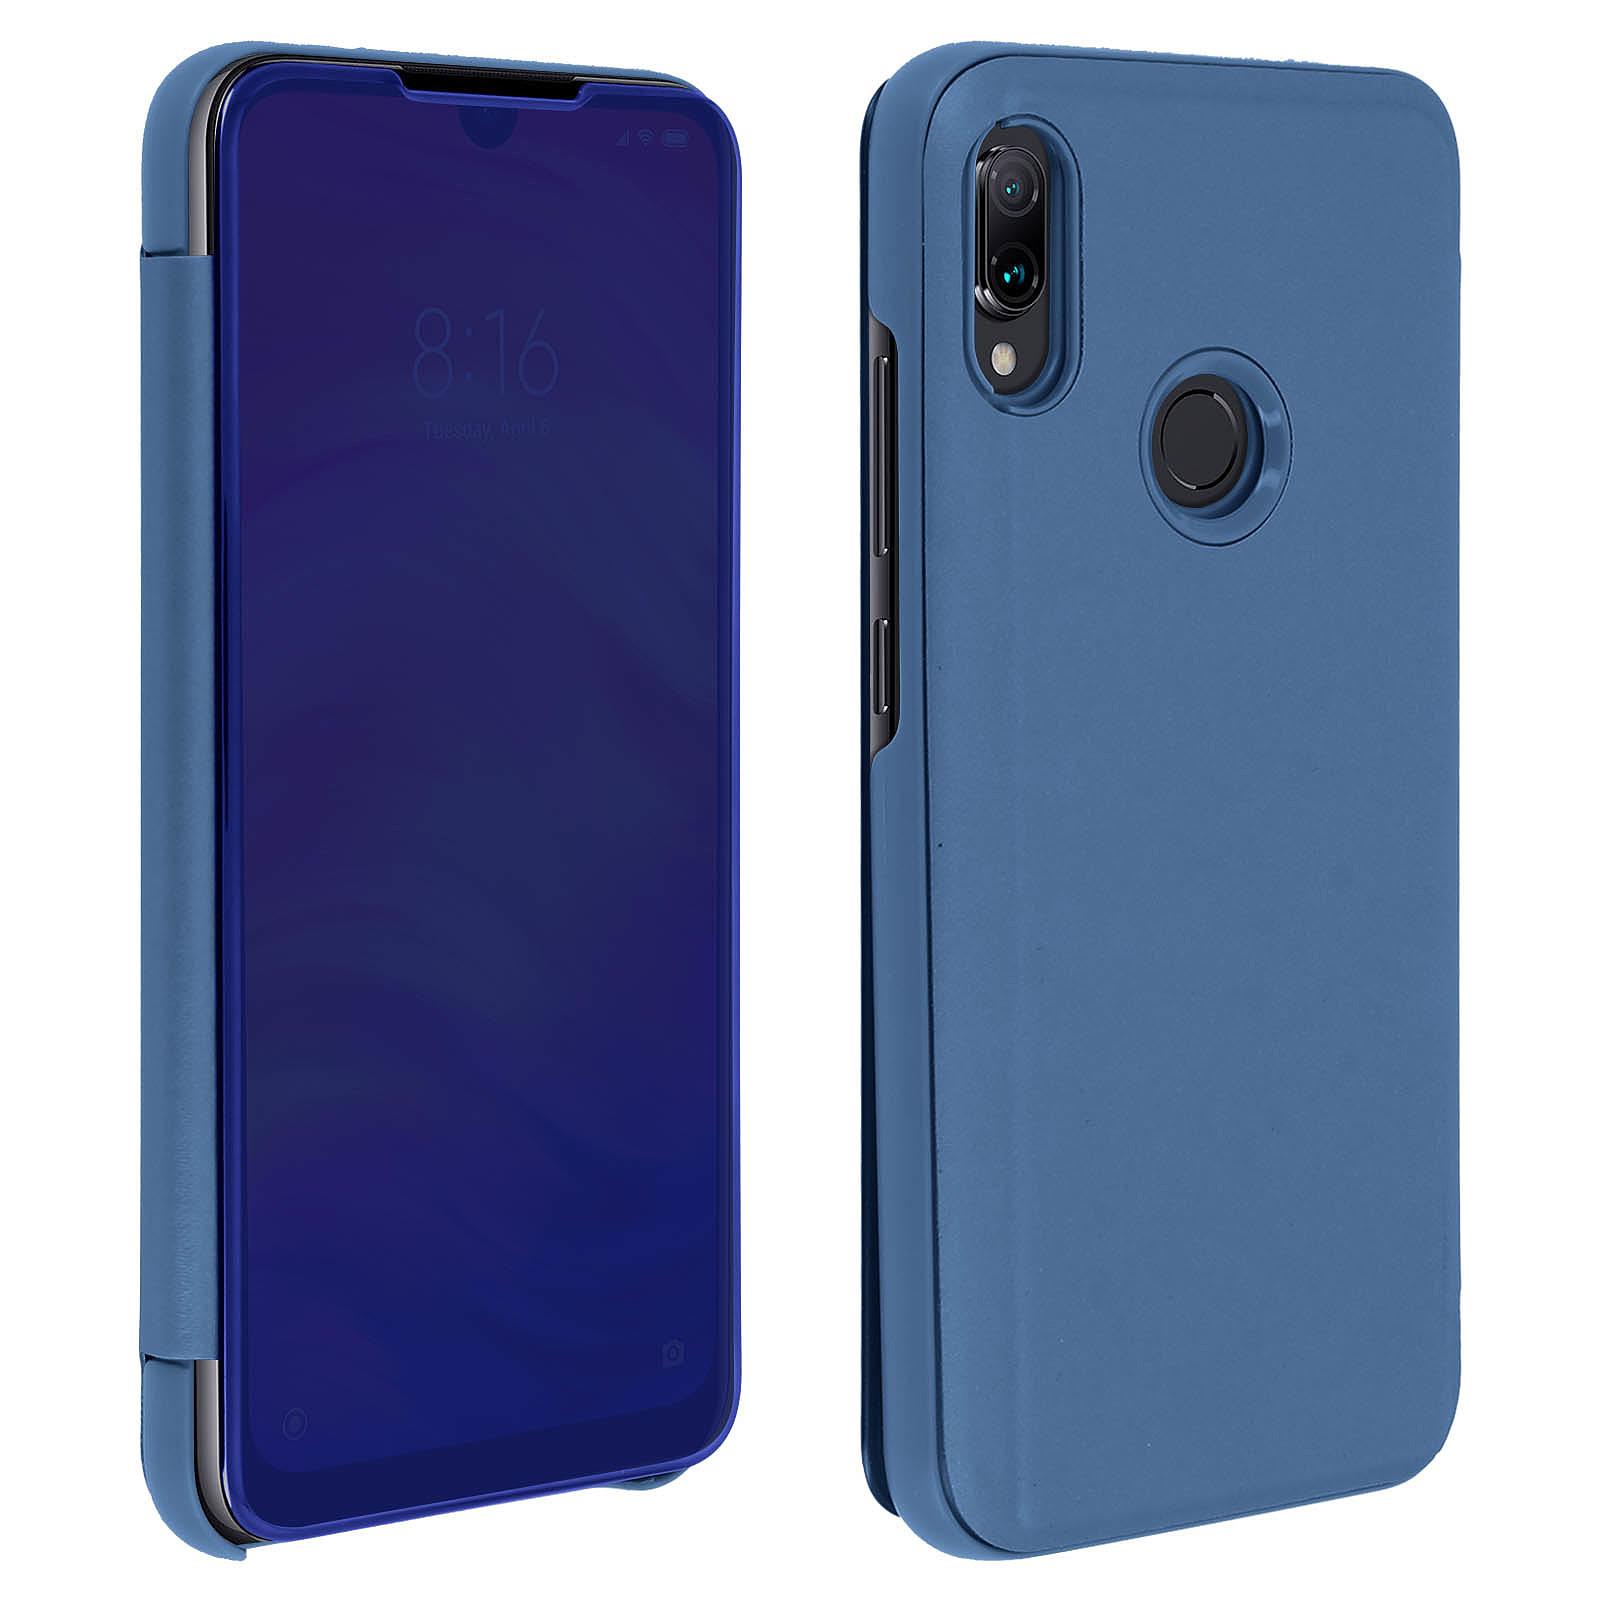 Avizar Etui folio Bleu pour Xiaomi Redmi Note 7